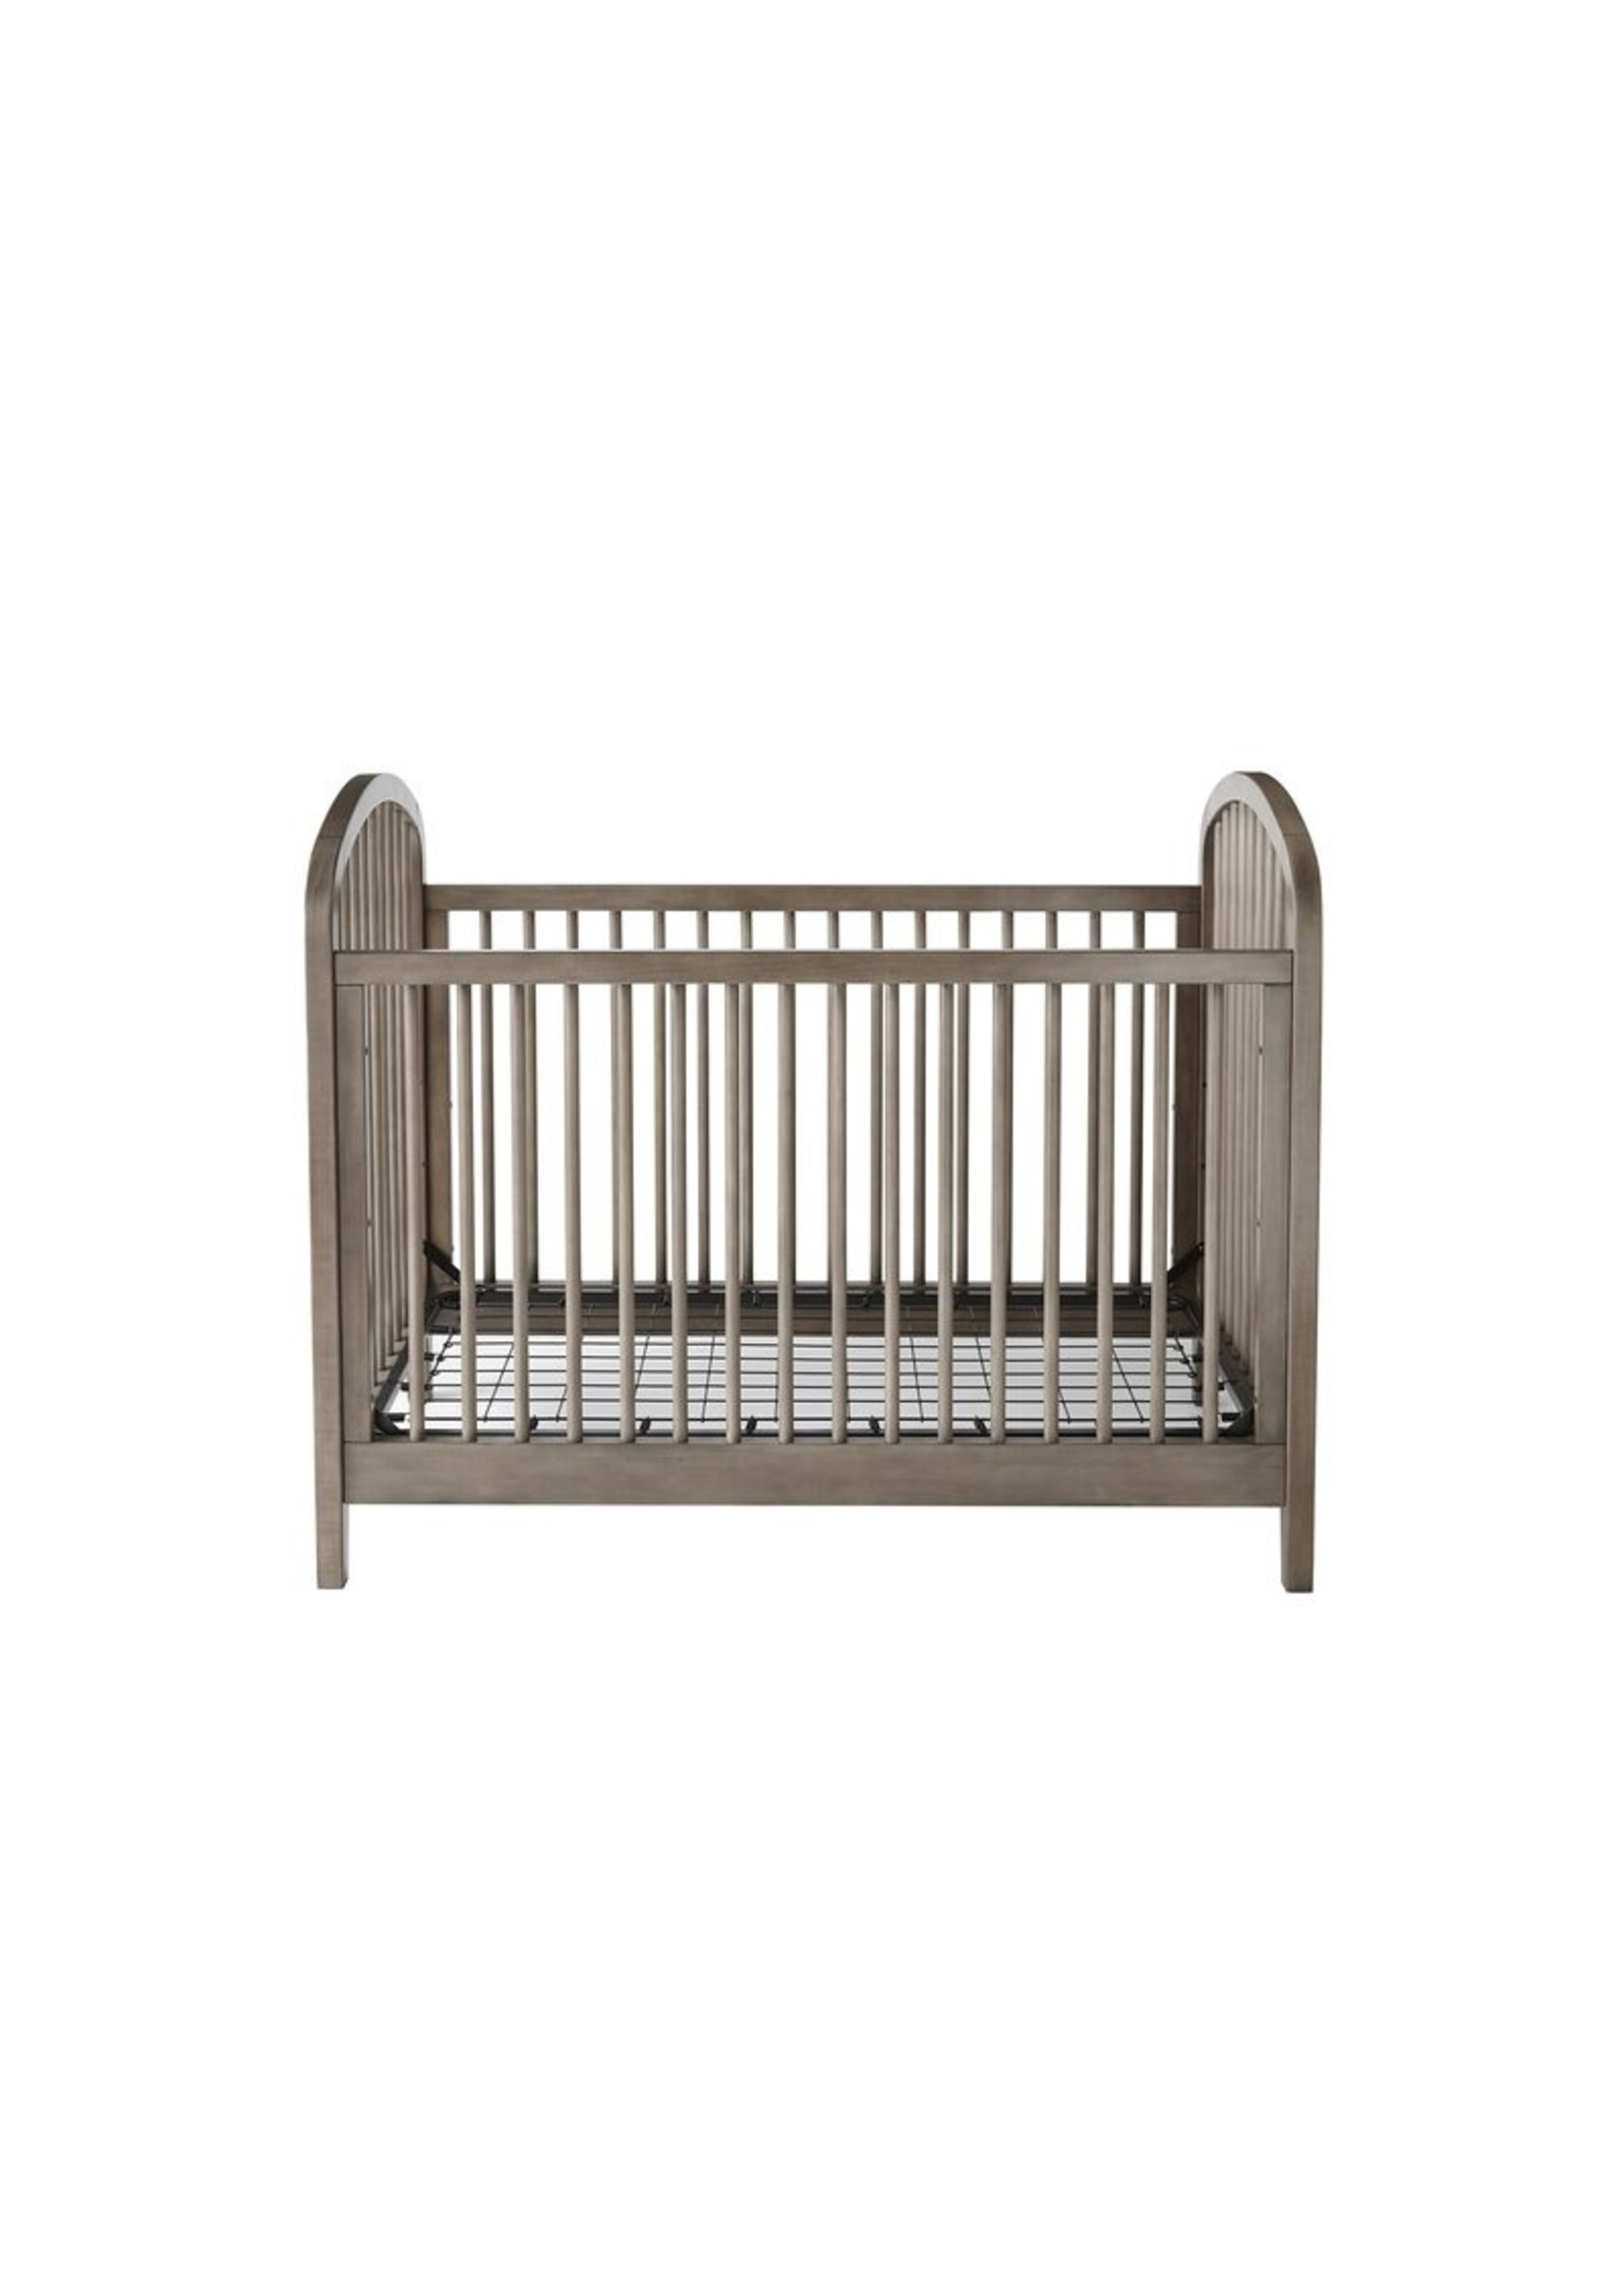 *Elston 3-in-1 Convertible Crib - Grey